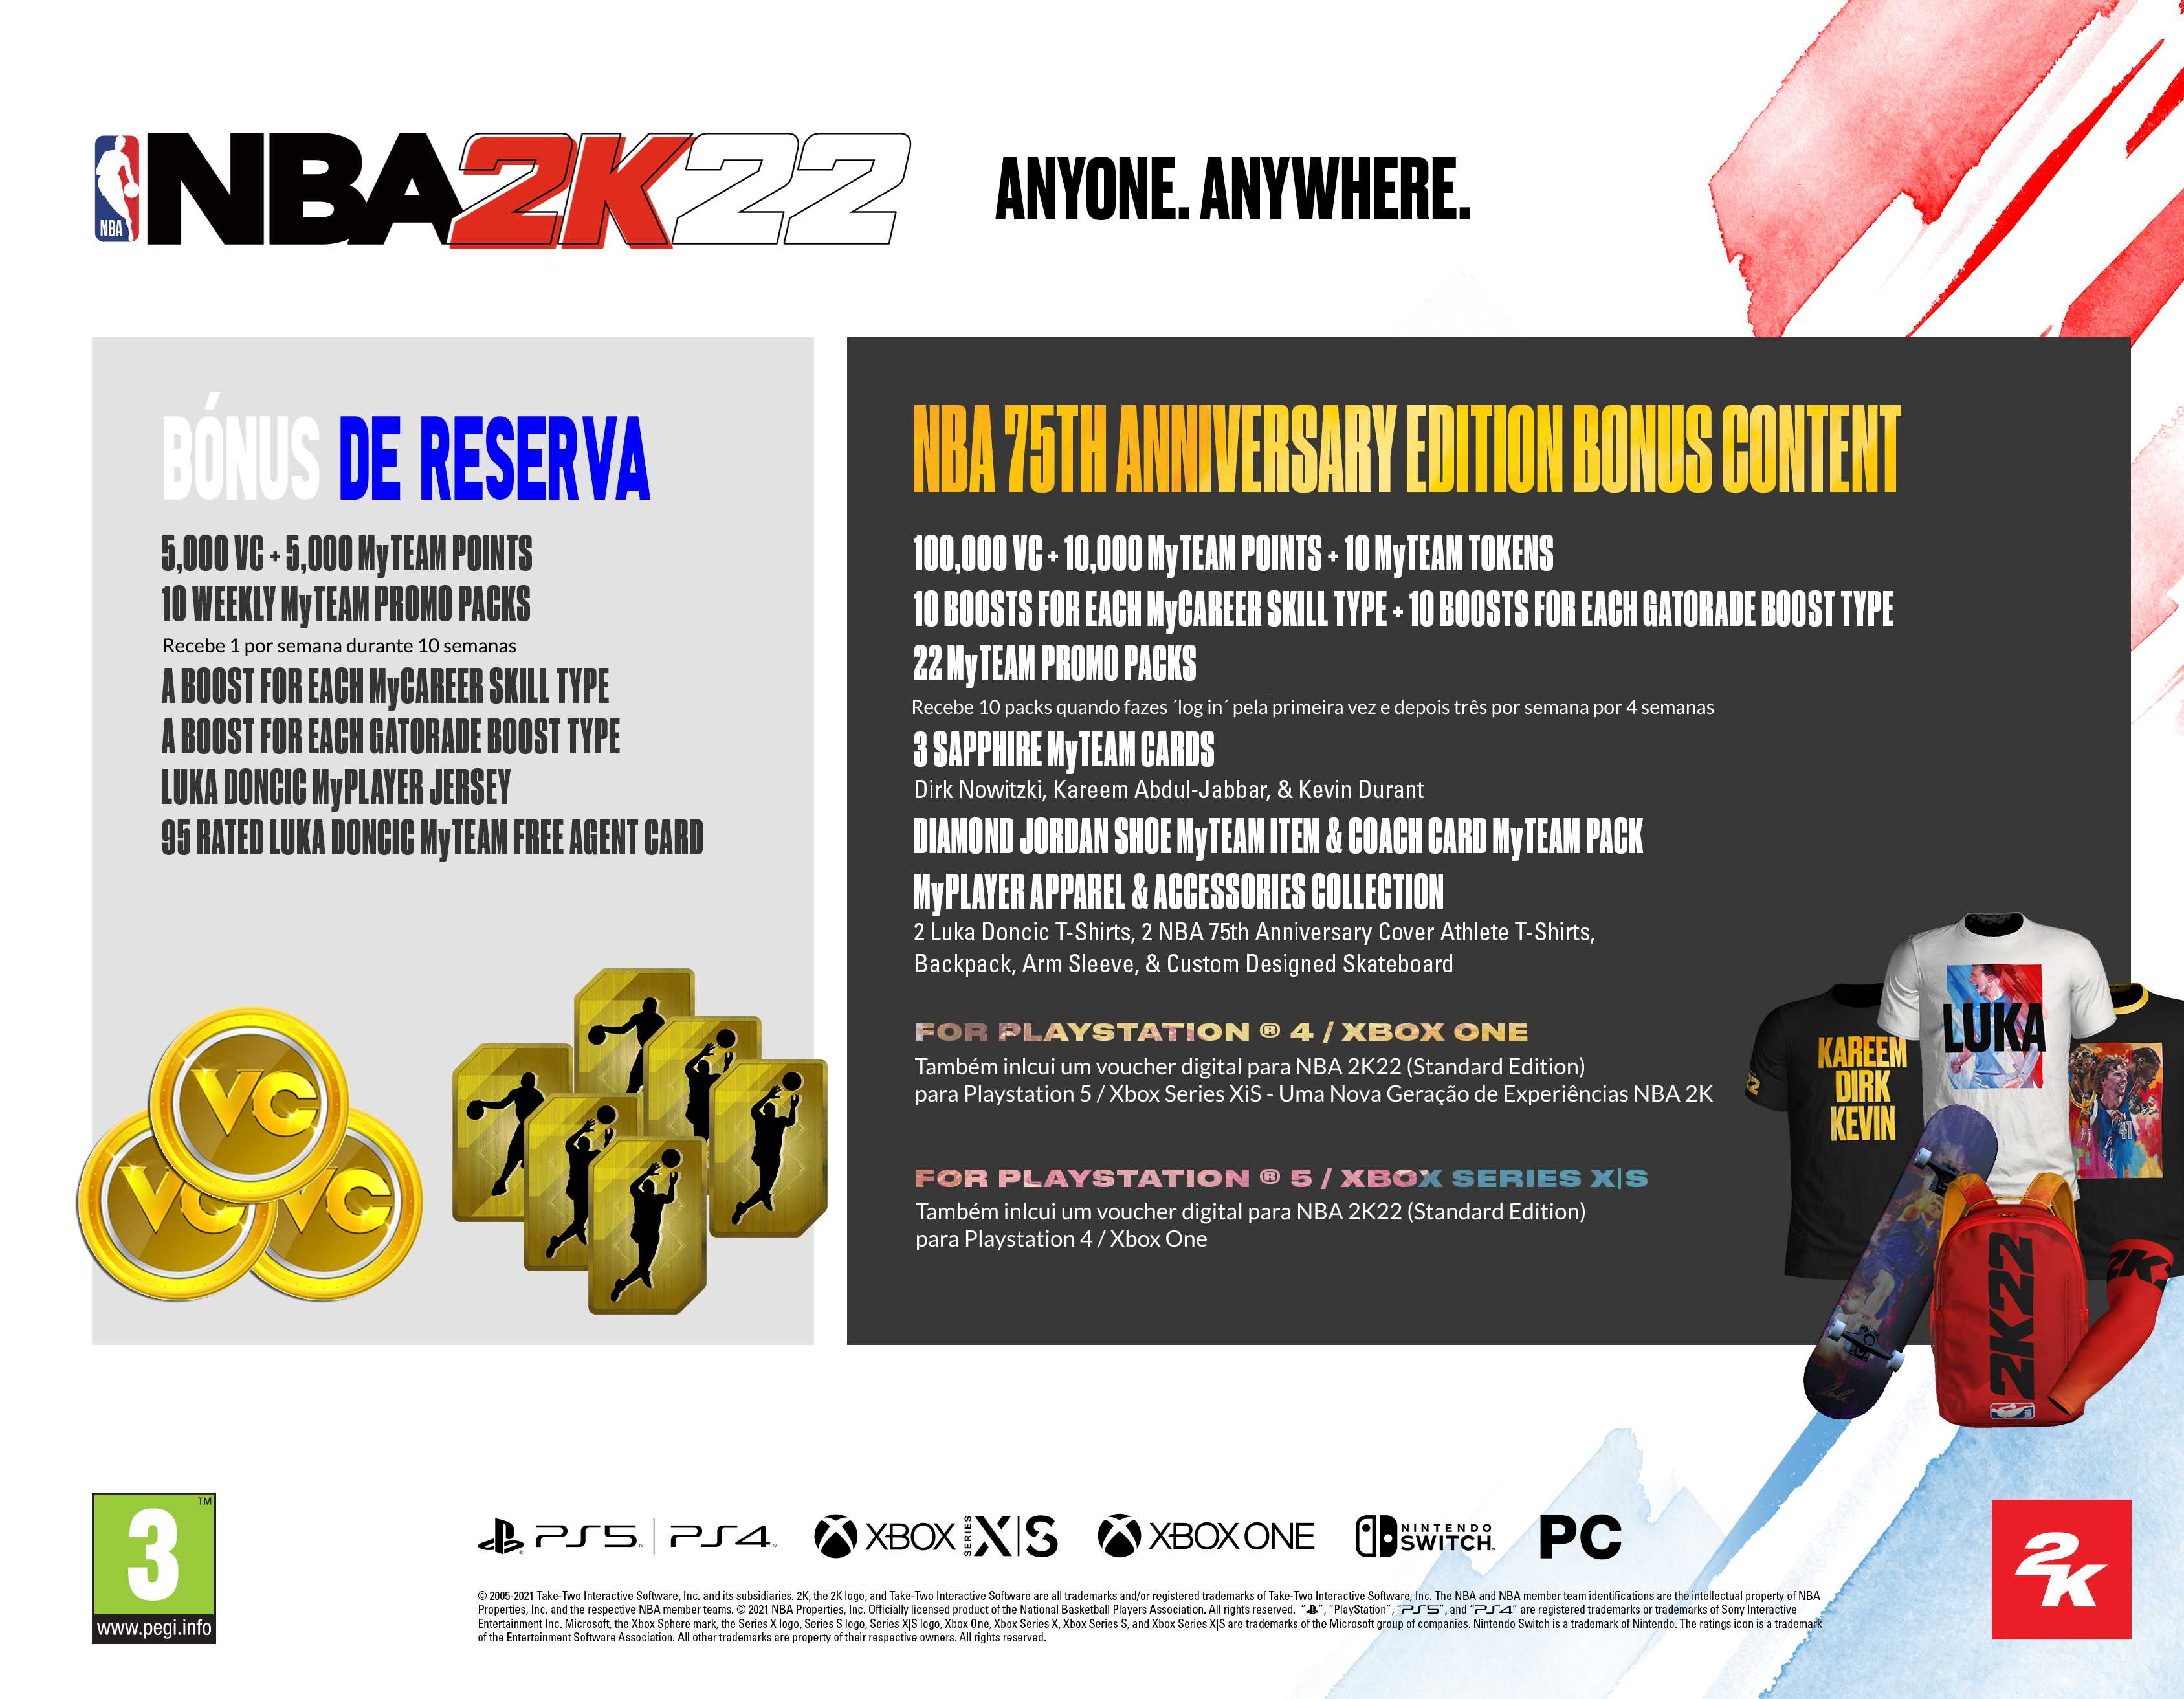 nba2k22 anniversary.jpg